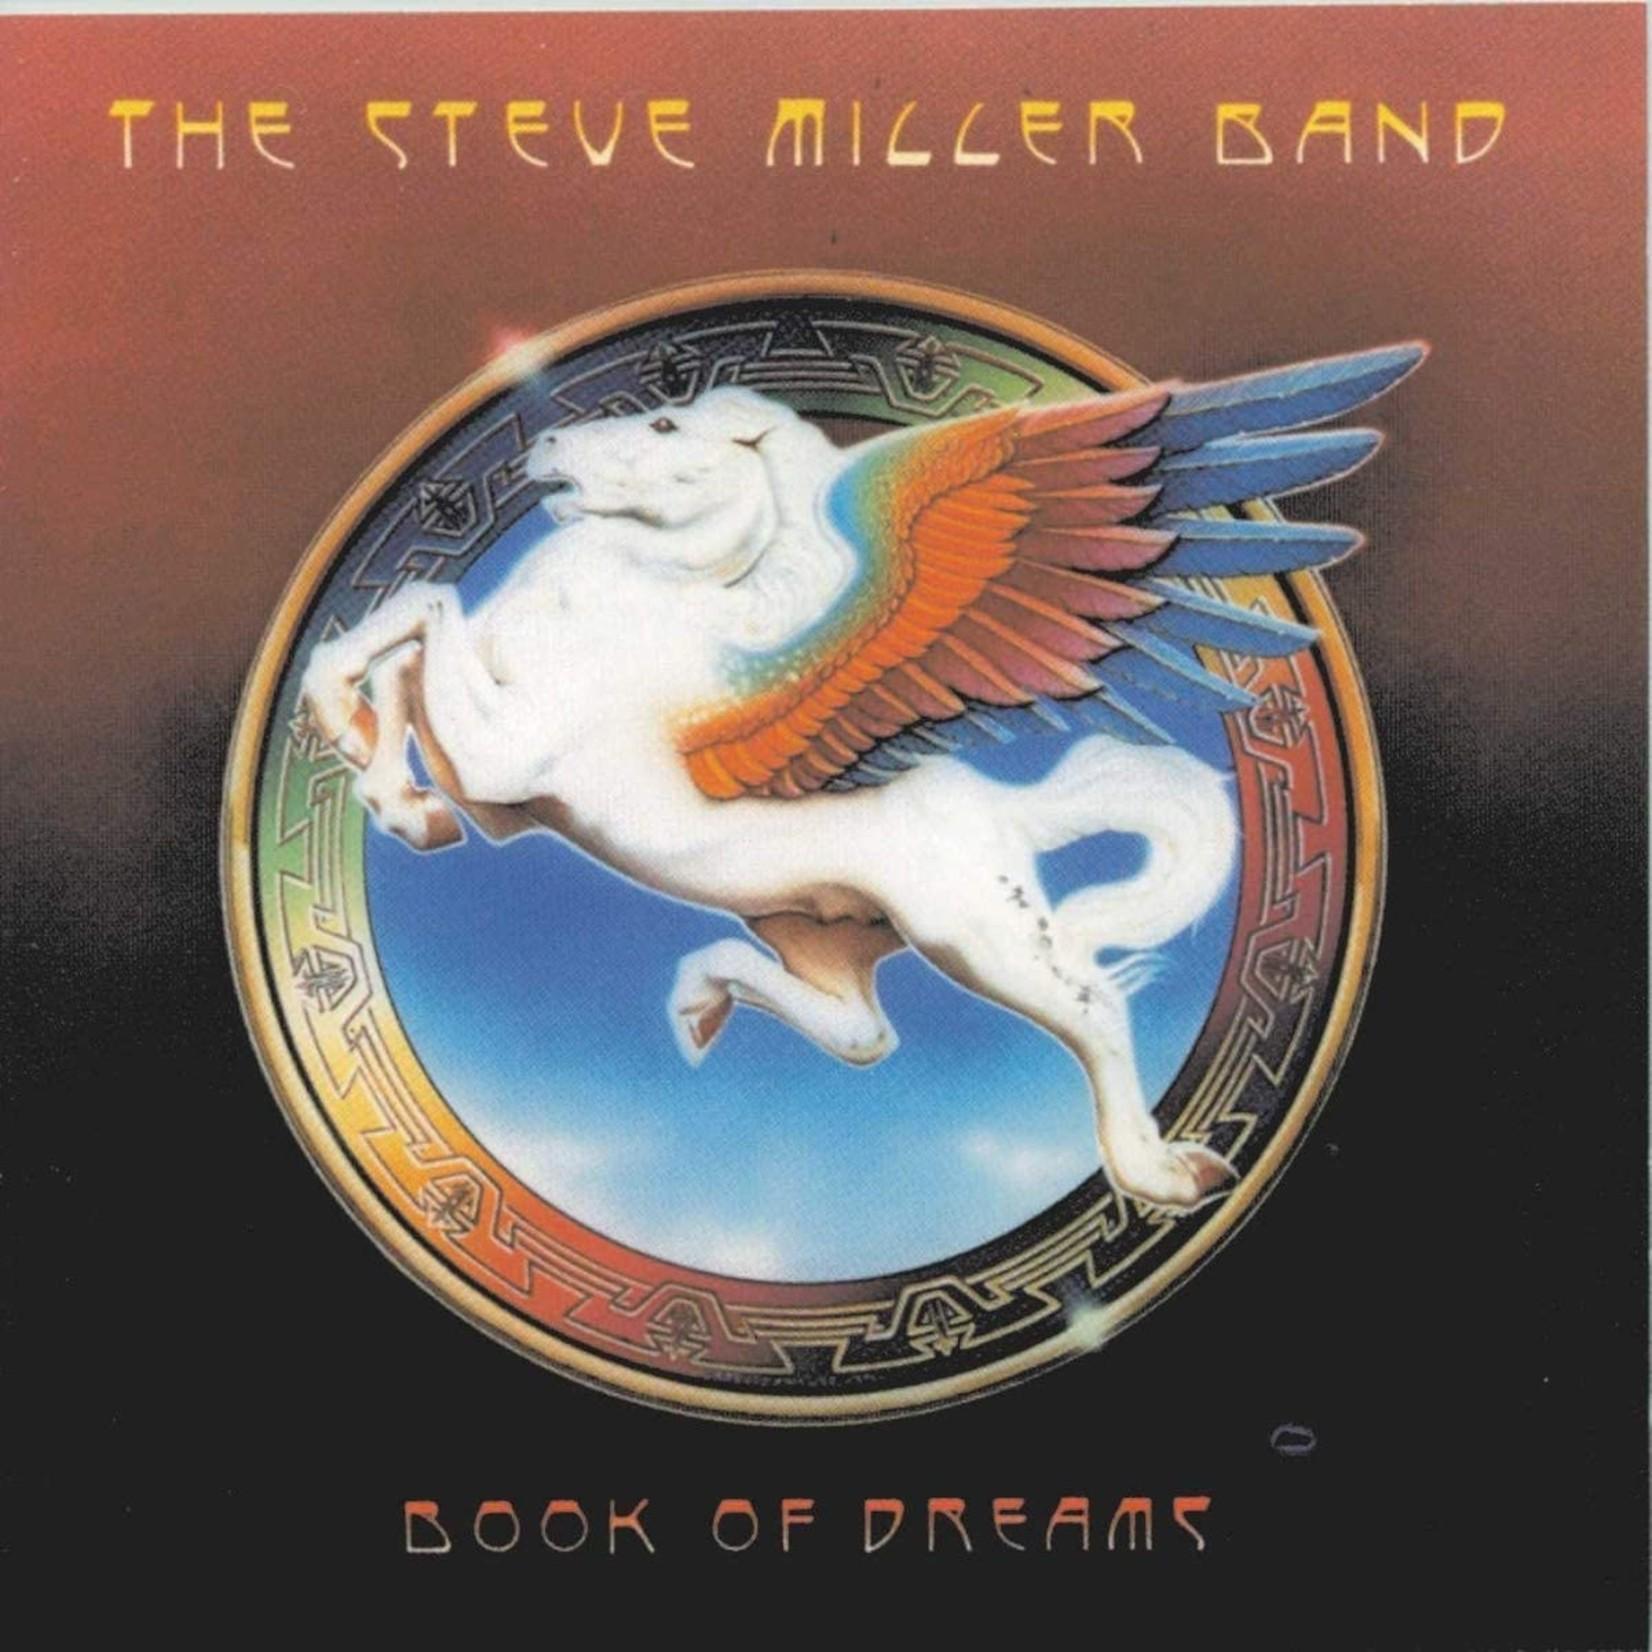 STEVE MILLER BAND BOOK OF DREAMS (LP)